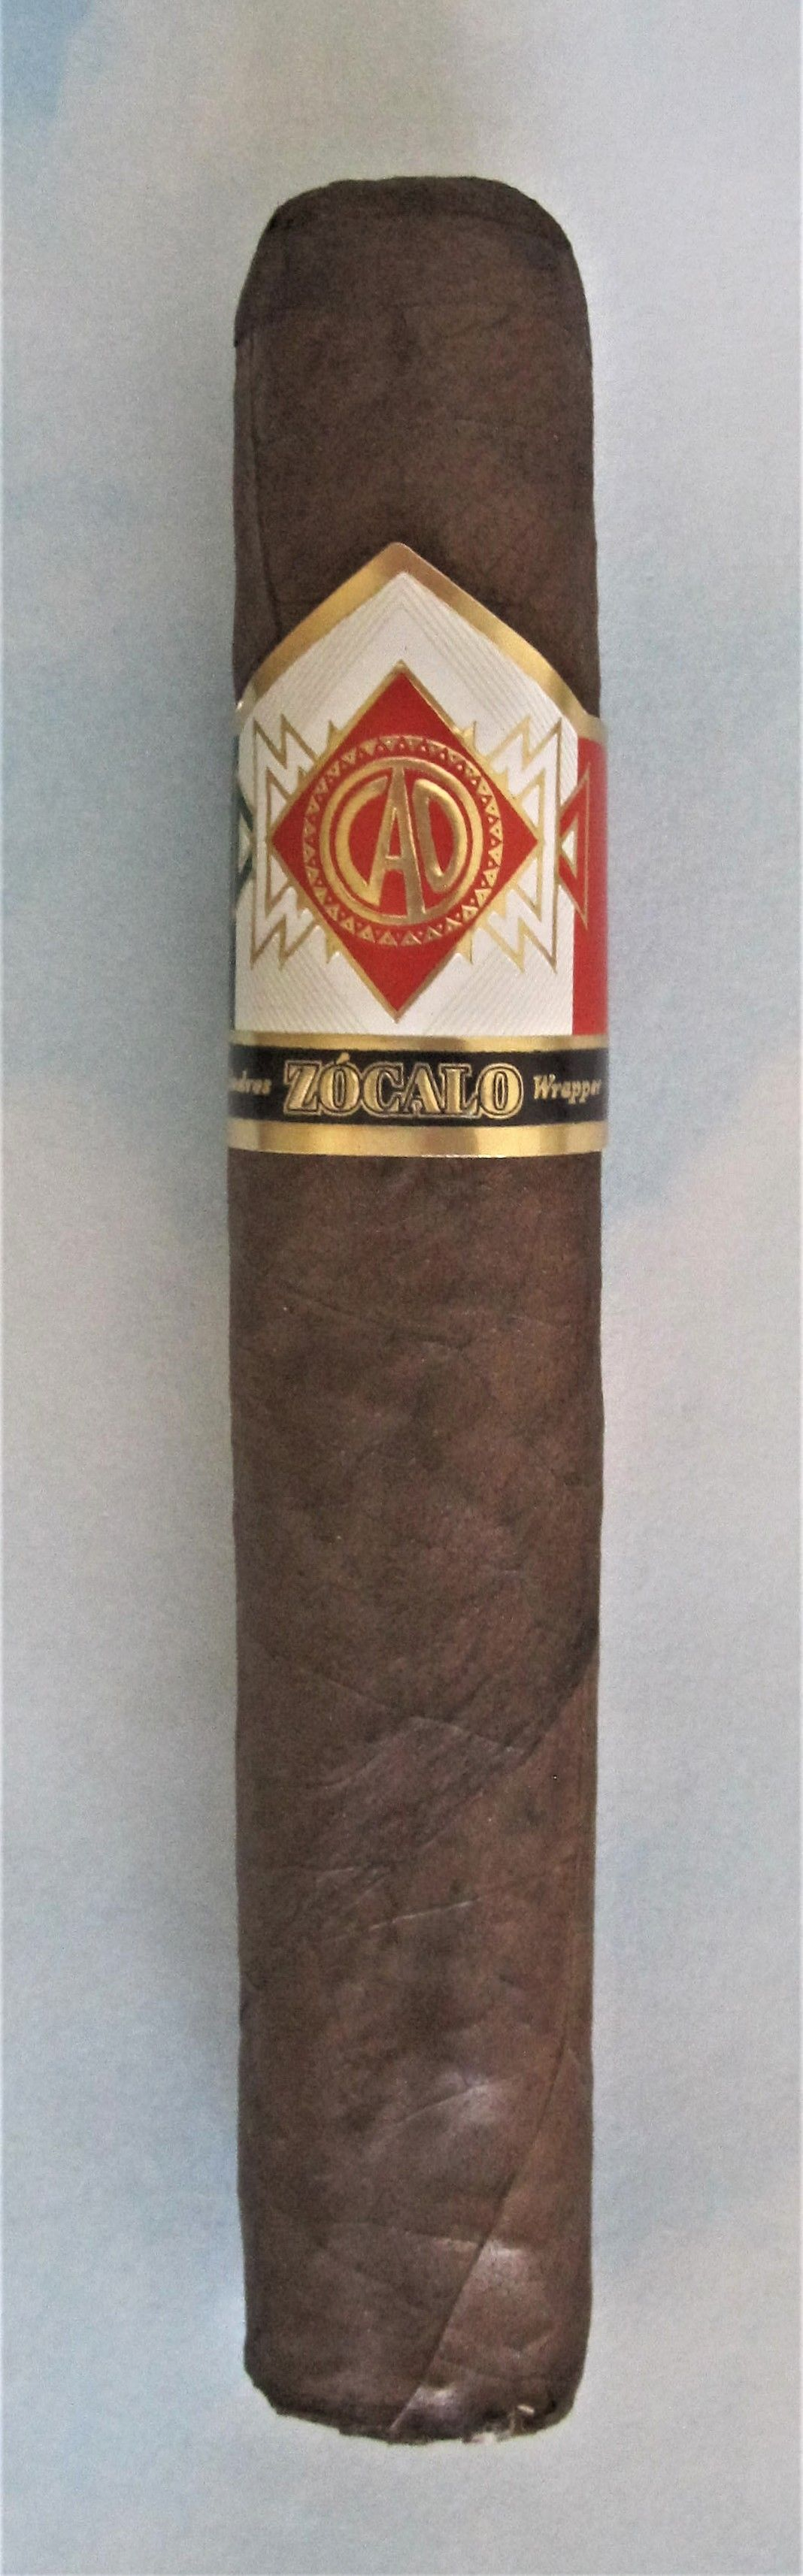 CAO Zocalo Cigar